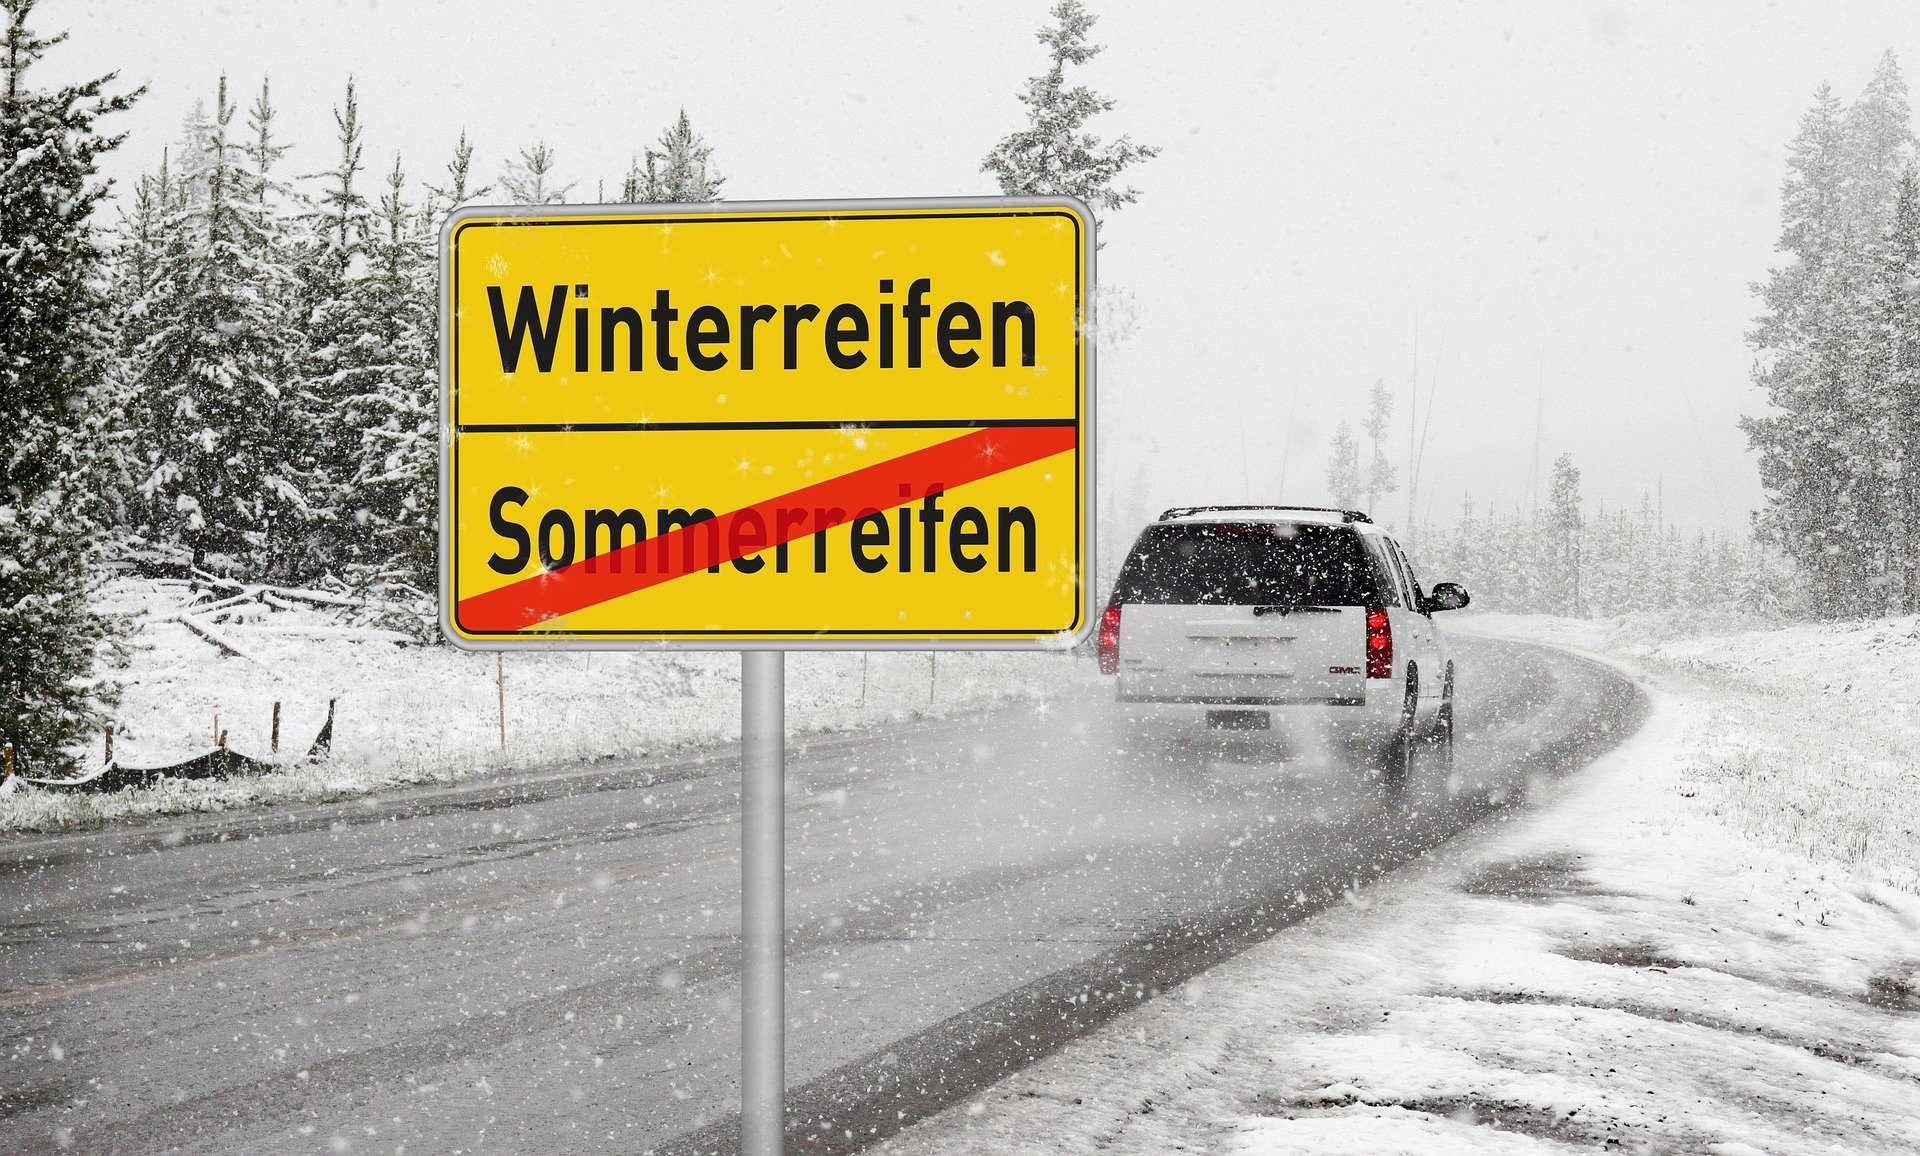 winter-tires-2823077_1920